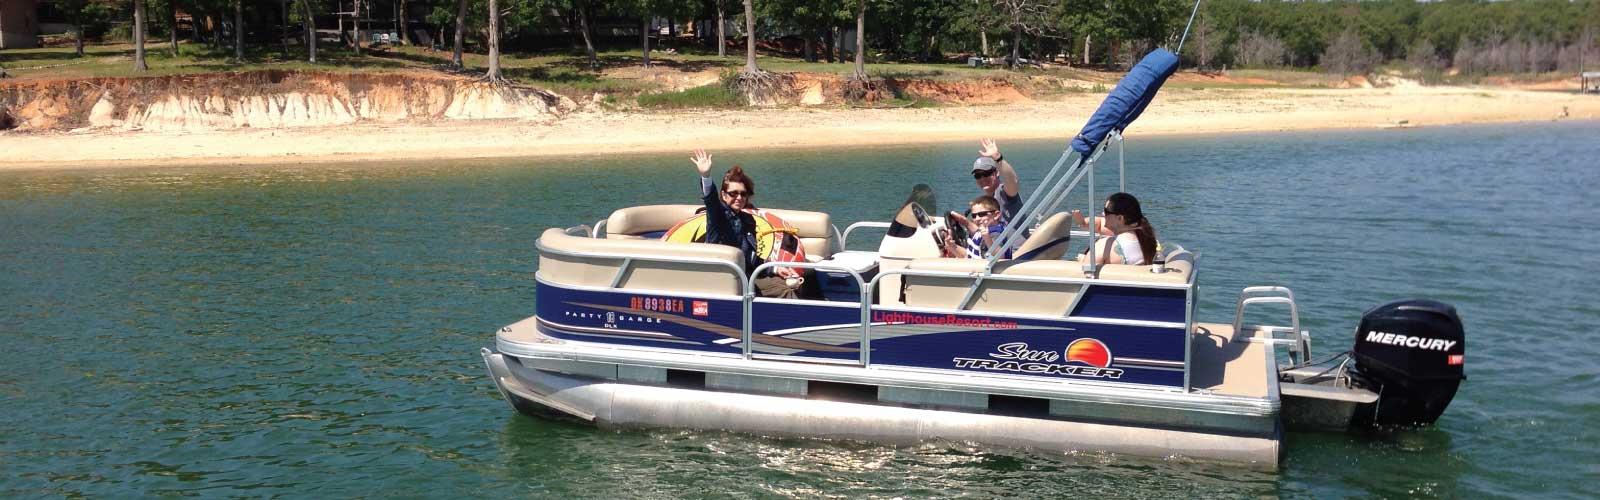 Boat Rental Policies